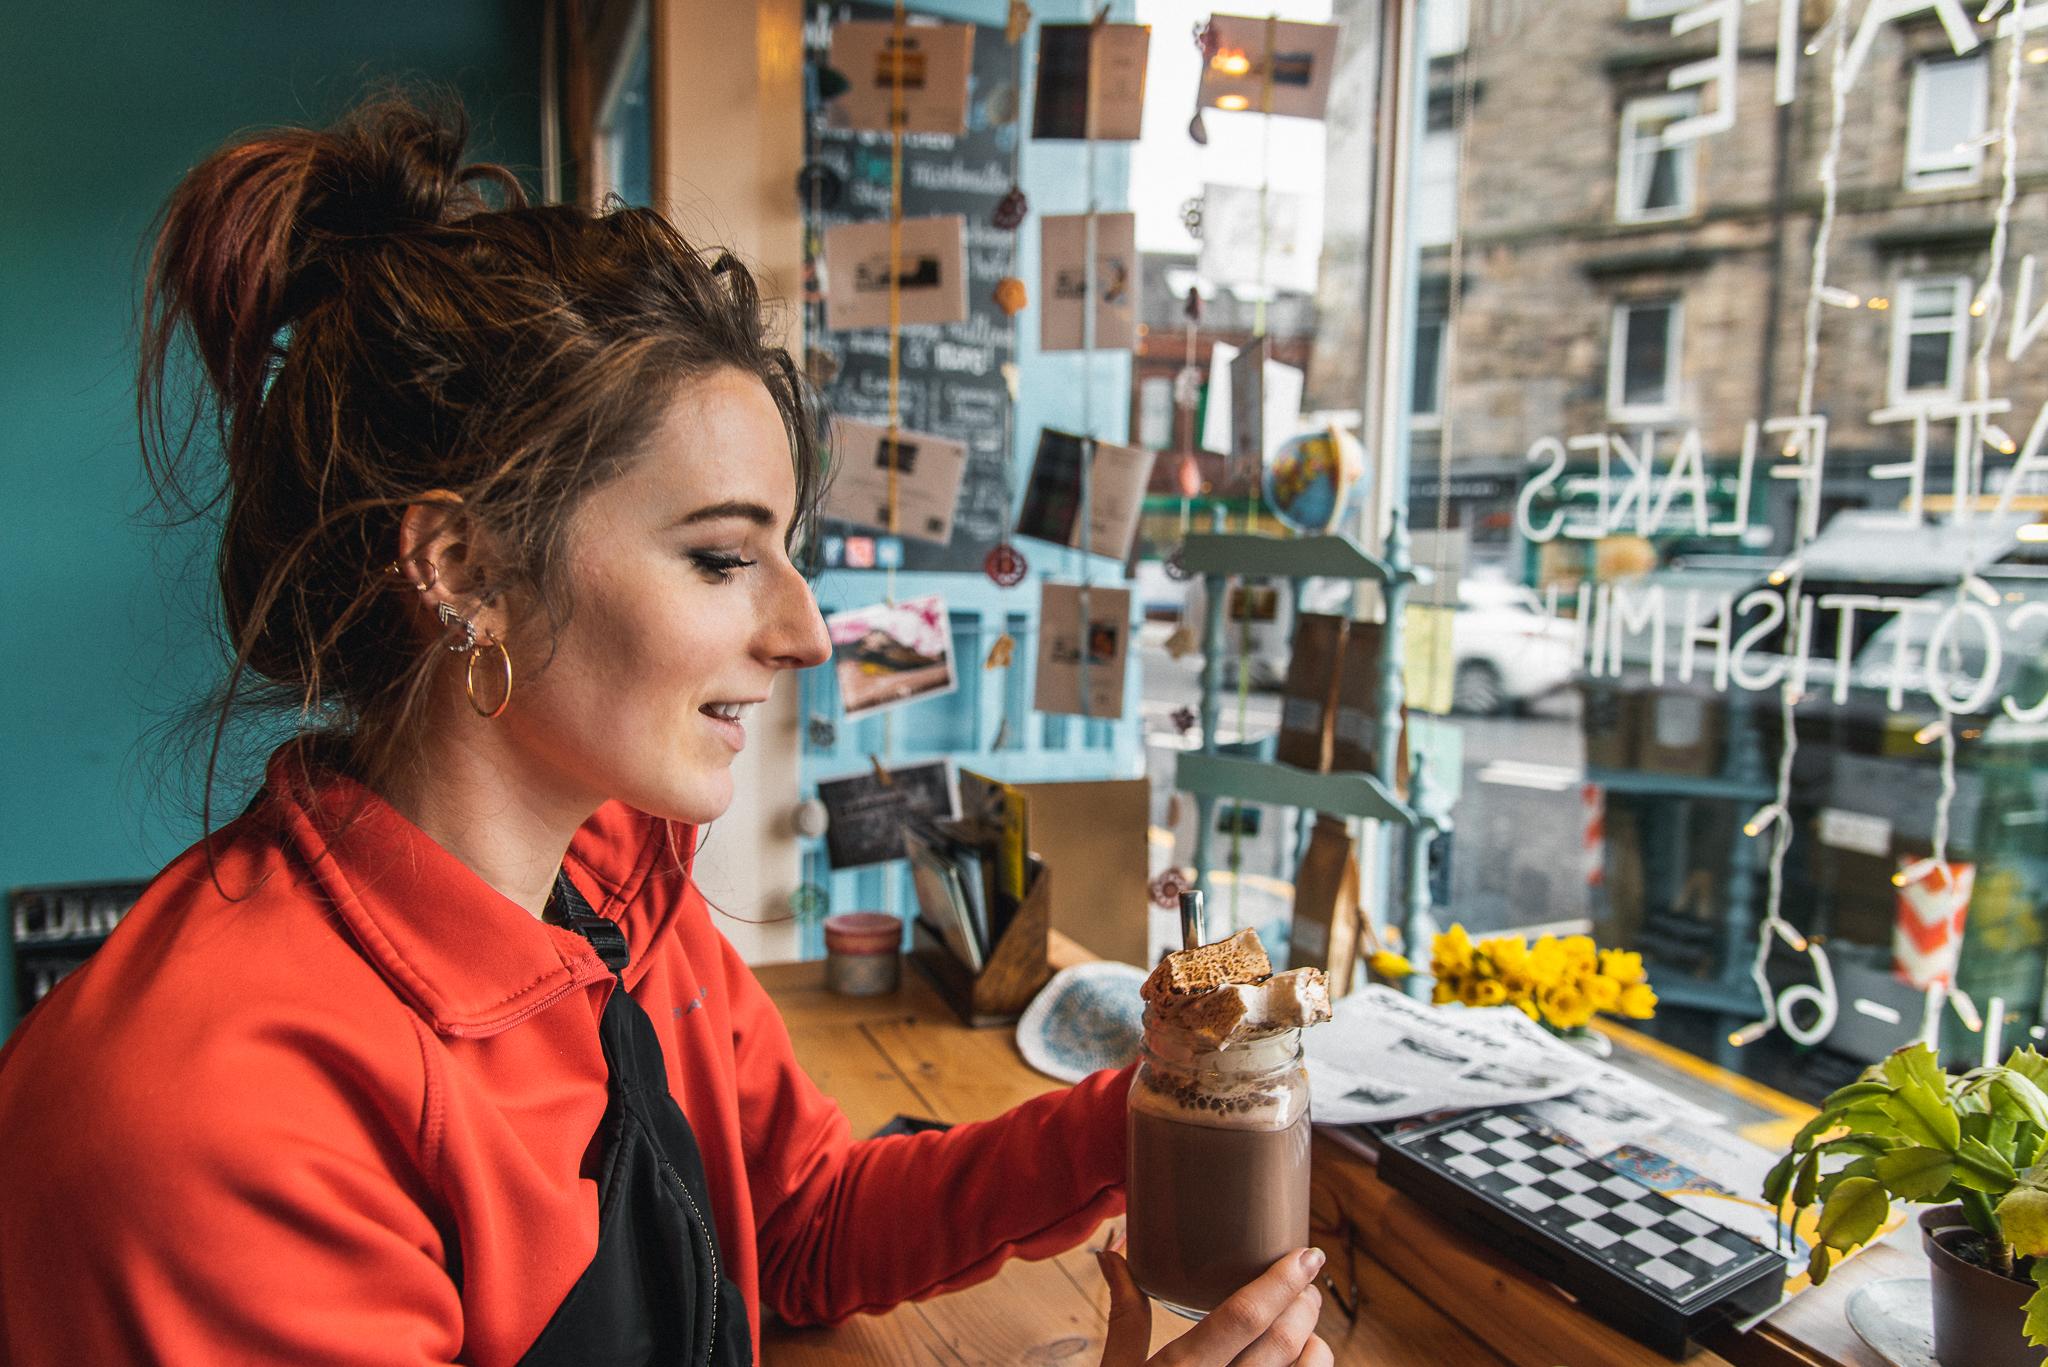 marshmallow lady, scotland, edinburgh, colourful, travel